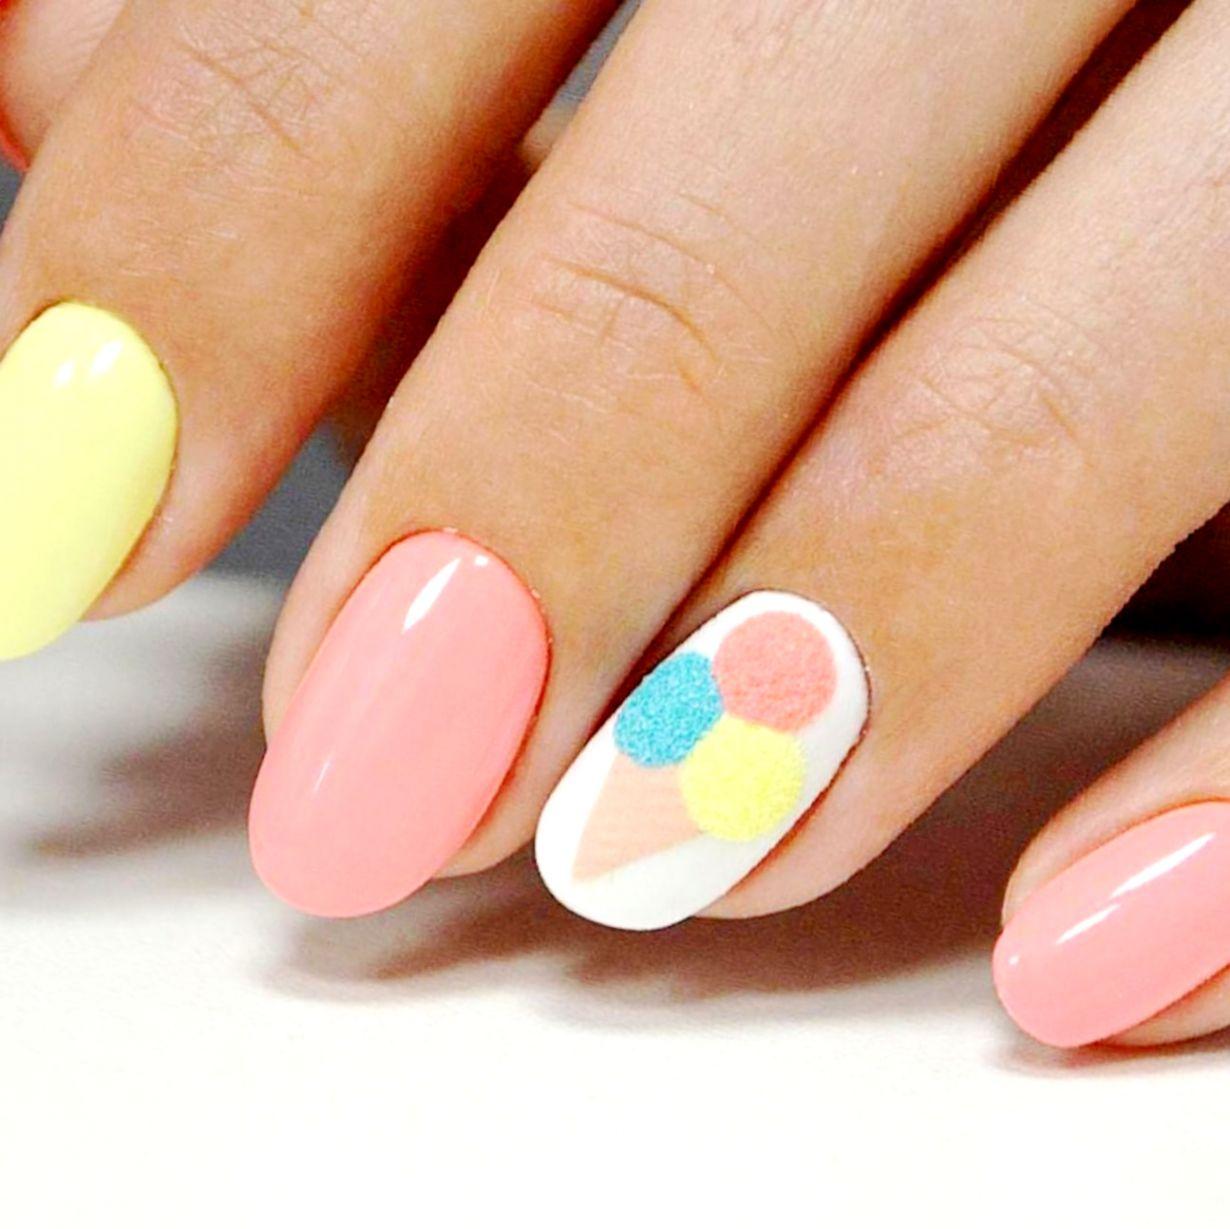 Designs for hd wallpapers. Nails clipart short nail